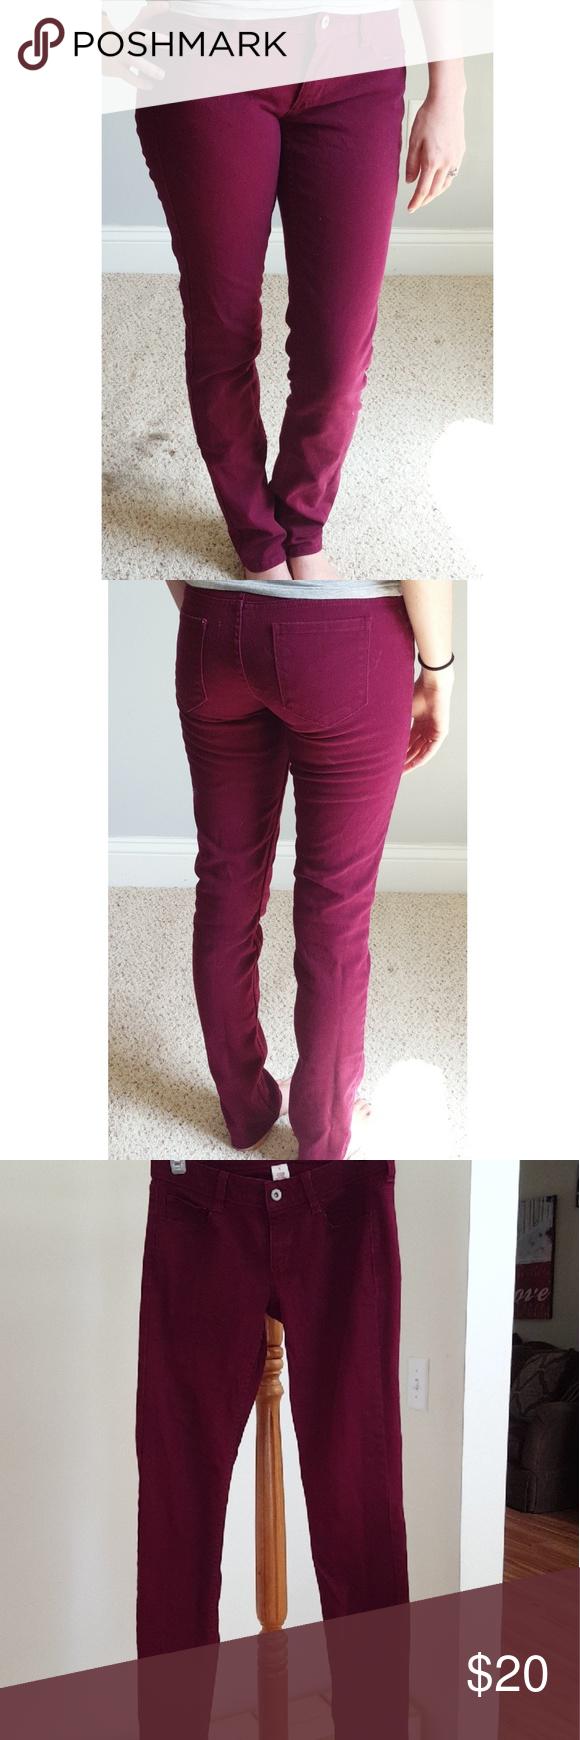 ddf07ee5008267 I just added this listing on Poshmark: Burgundy straight leg jeans size 5.  #shopmycloset #poshmark #fashion #shopping #style #forsale #Arizona Jean  Company ...